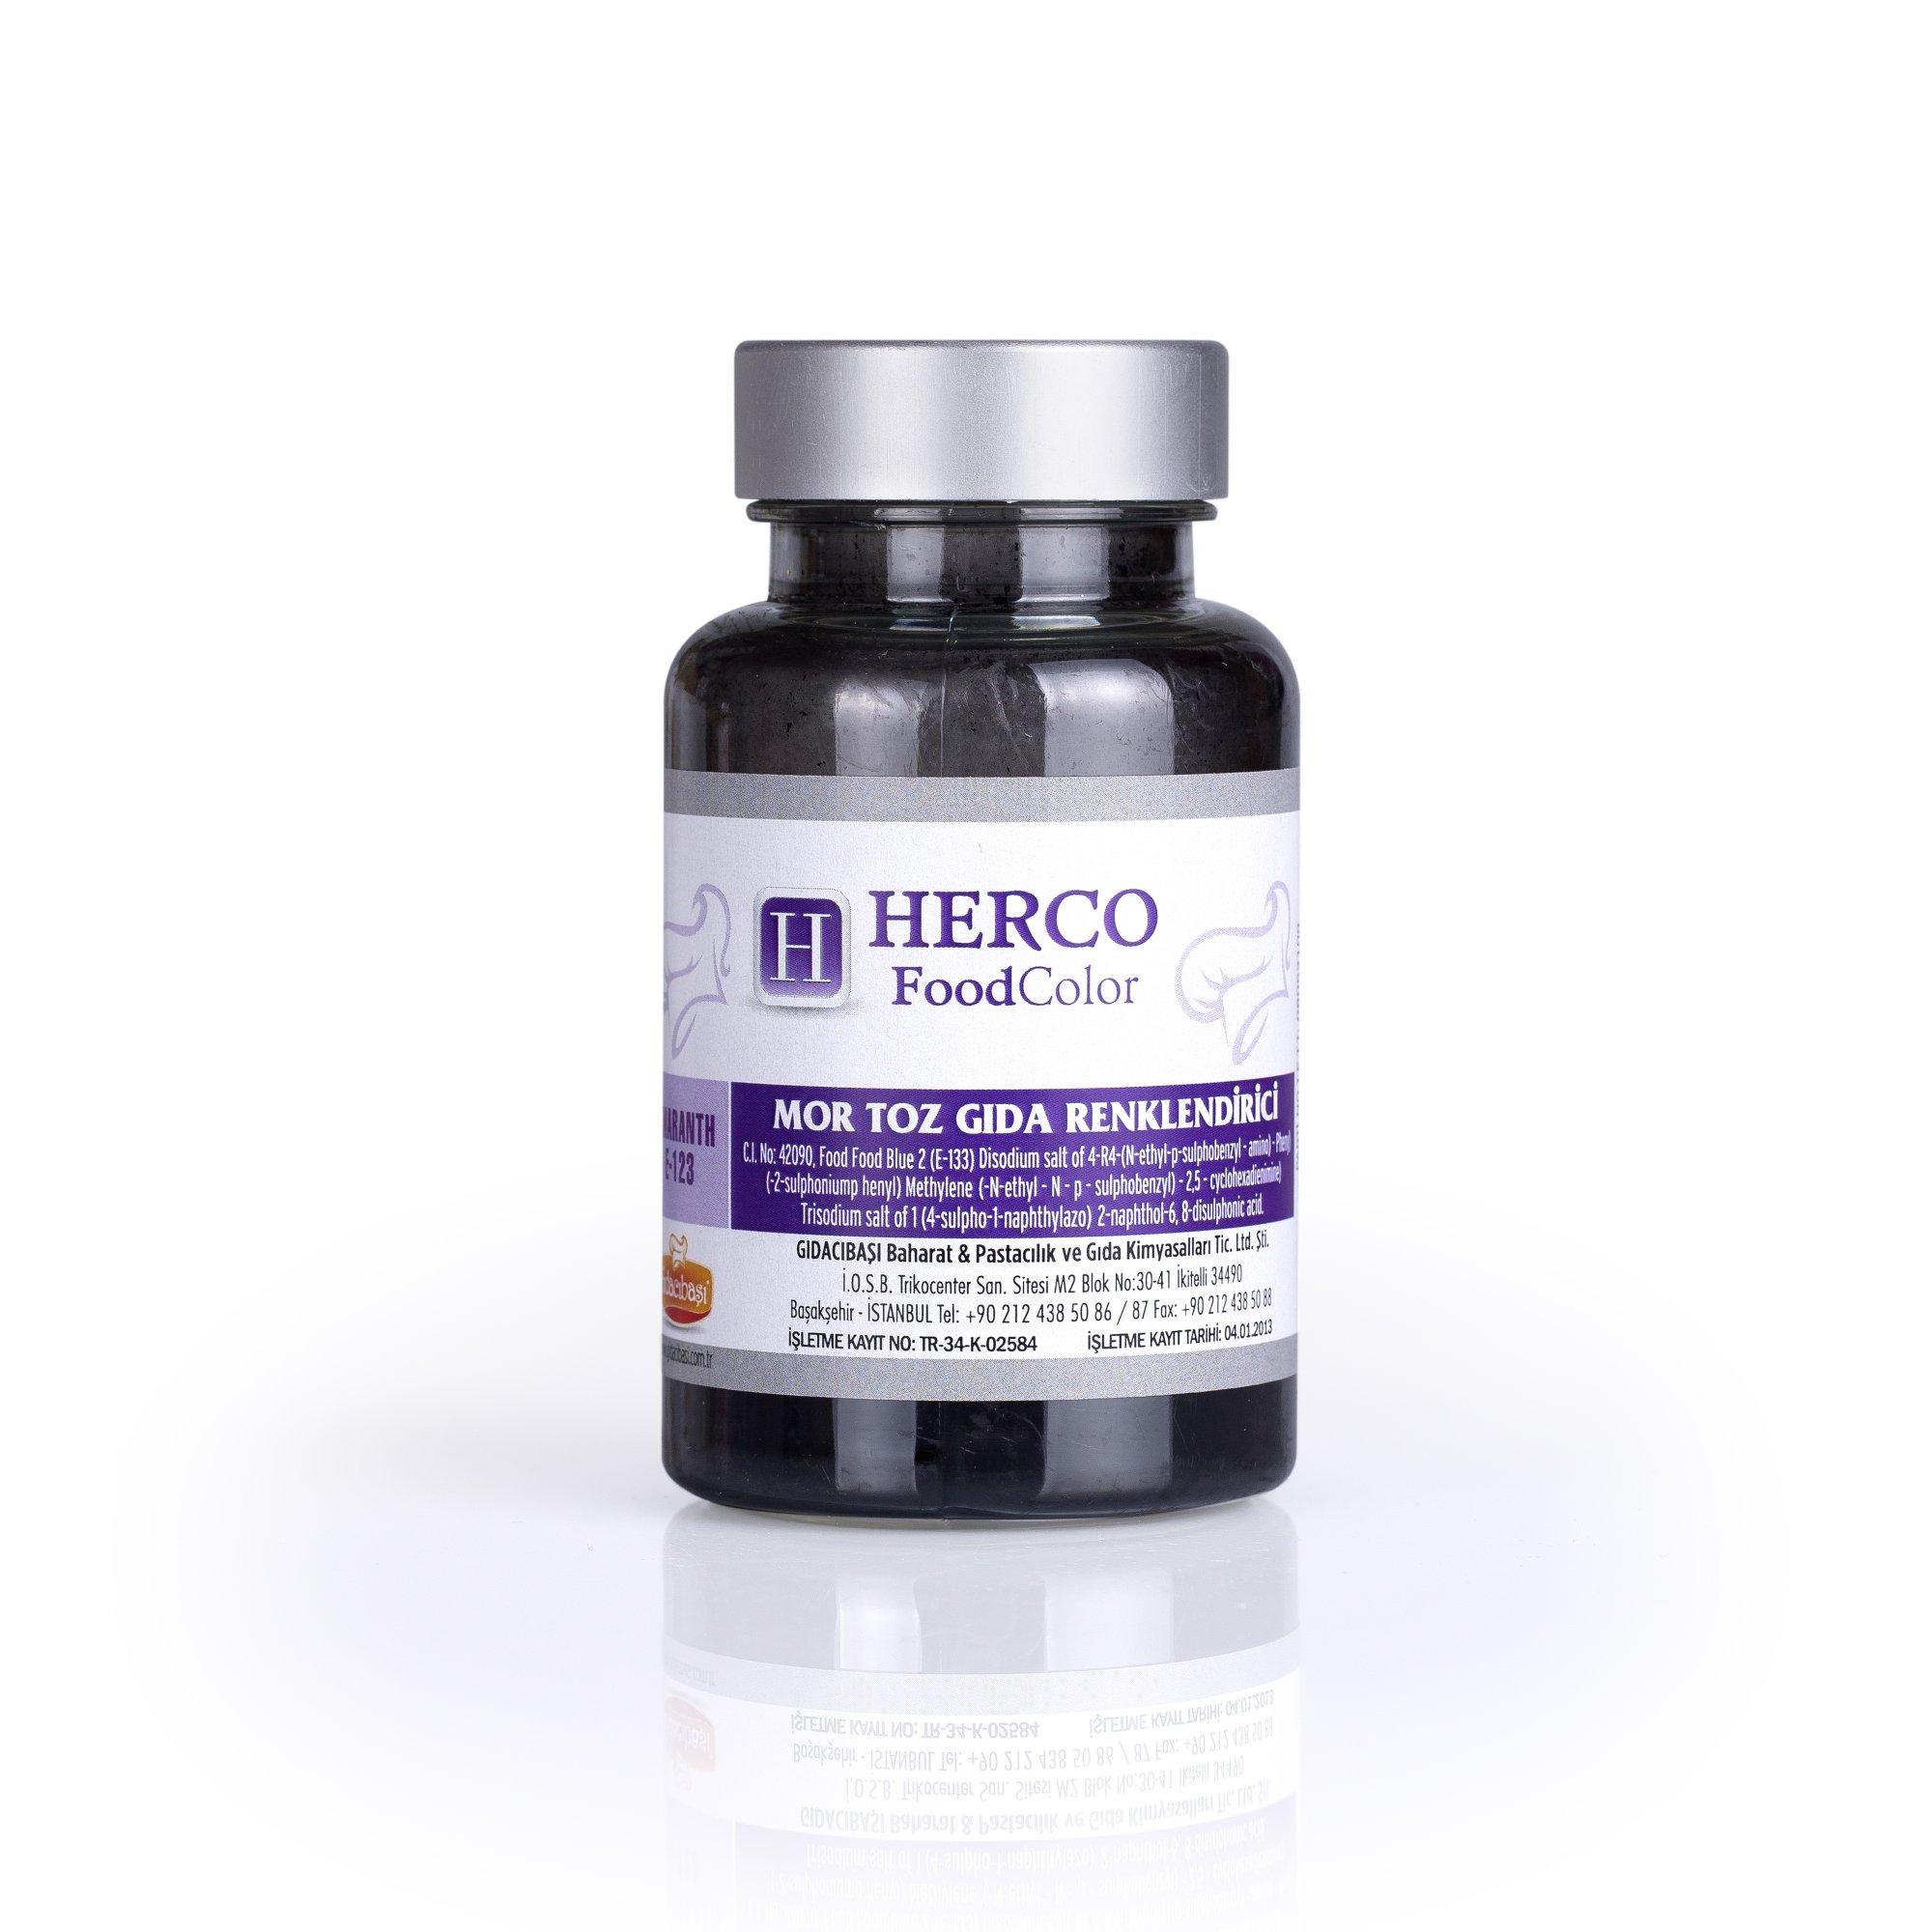 Mor Toz Gıda Renklendirici - Herco FoodColor